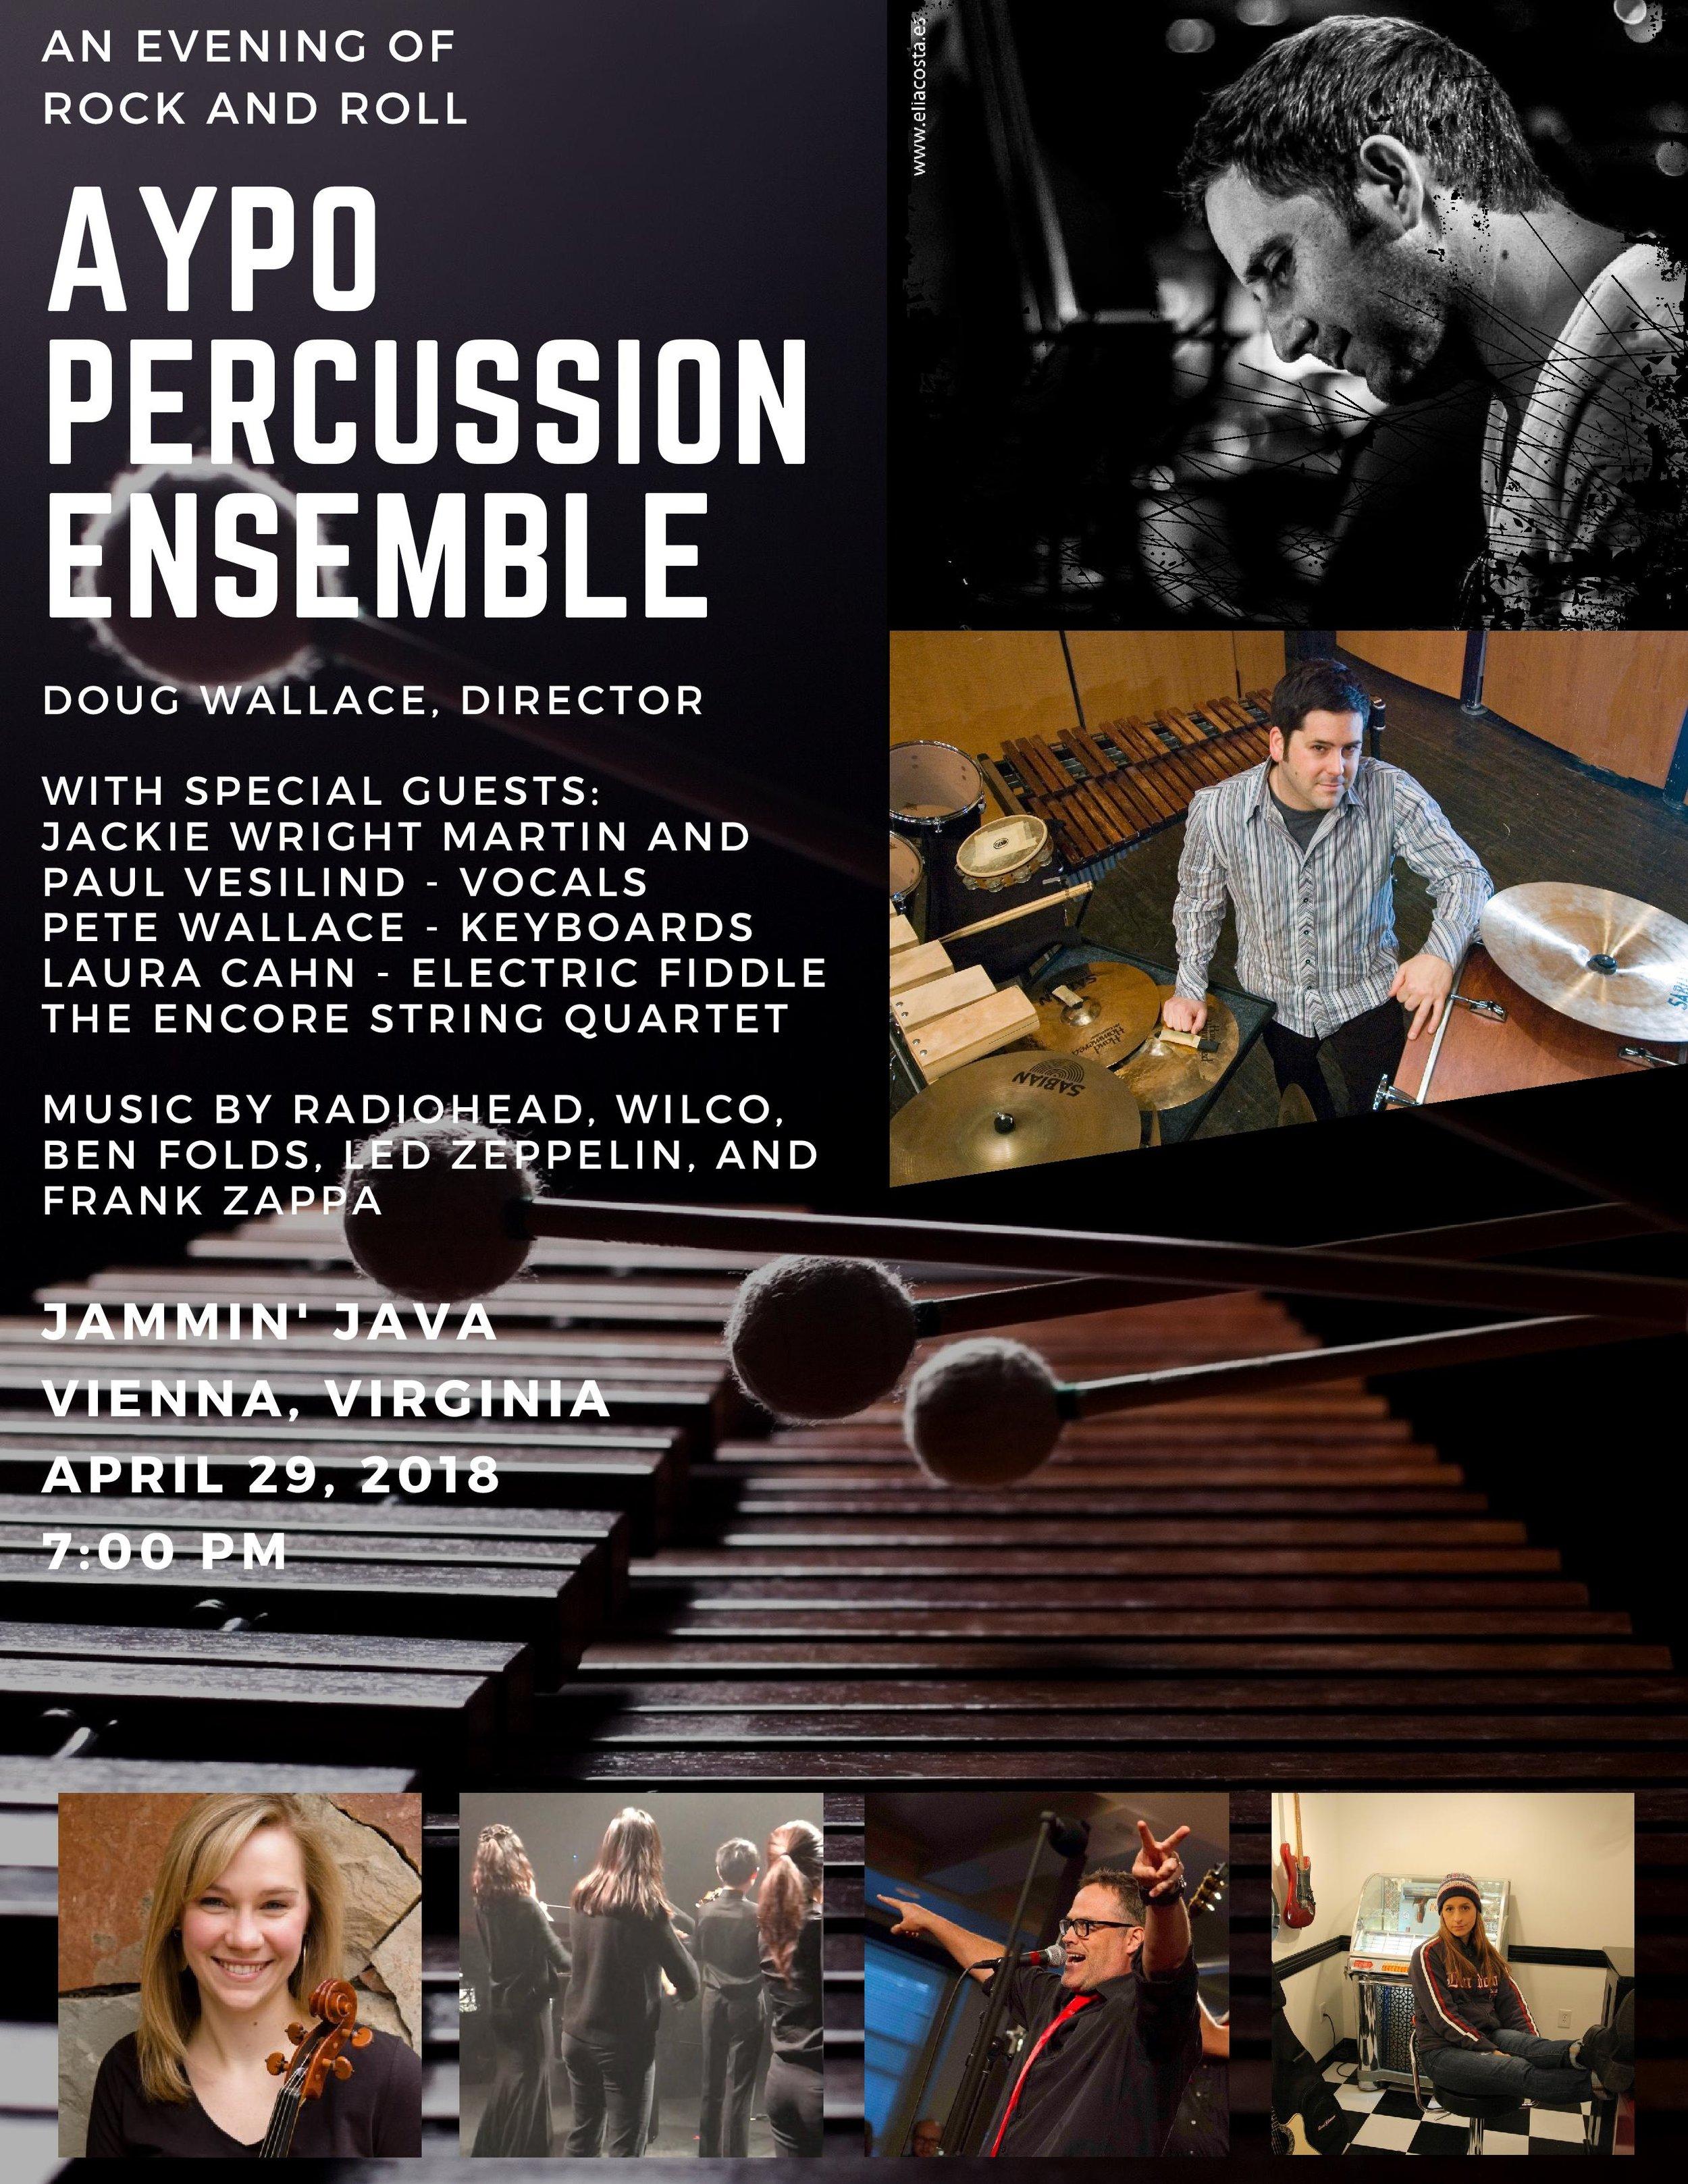 AYPO Percussion Ensemble 2018 at JJ-page-001.jpg